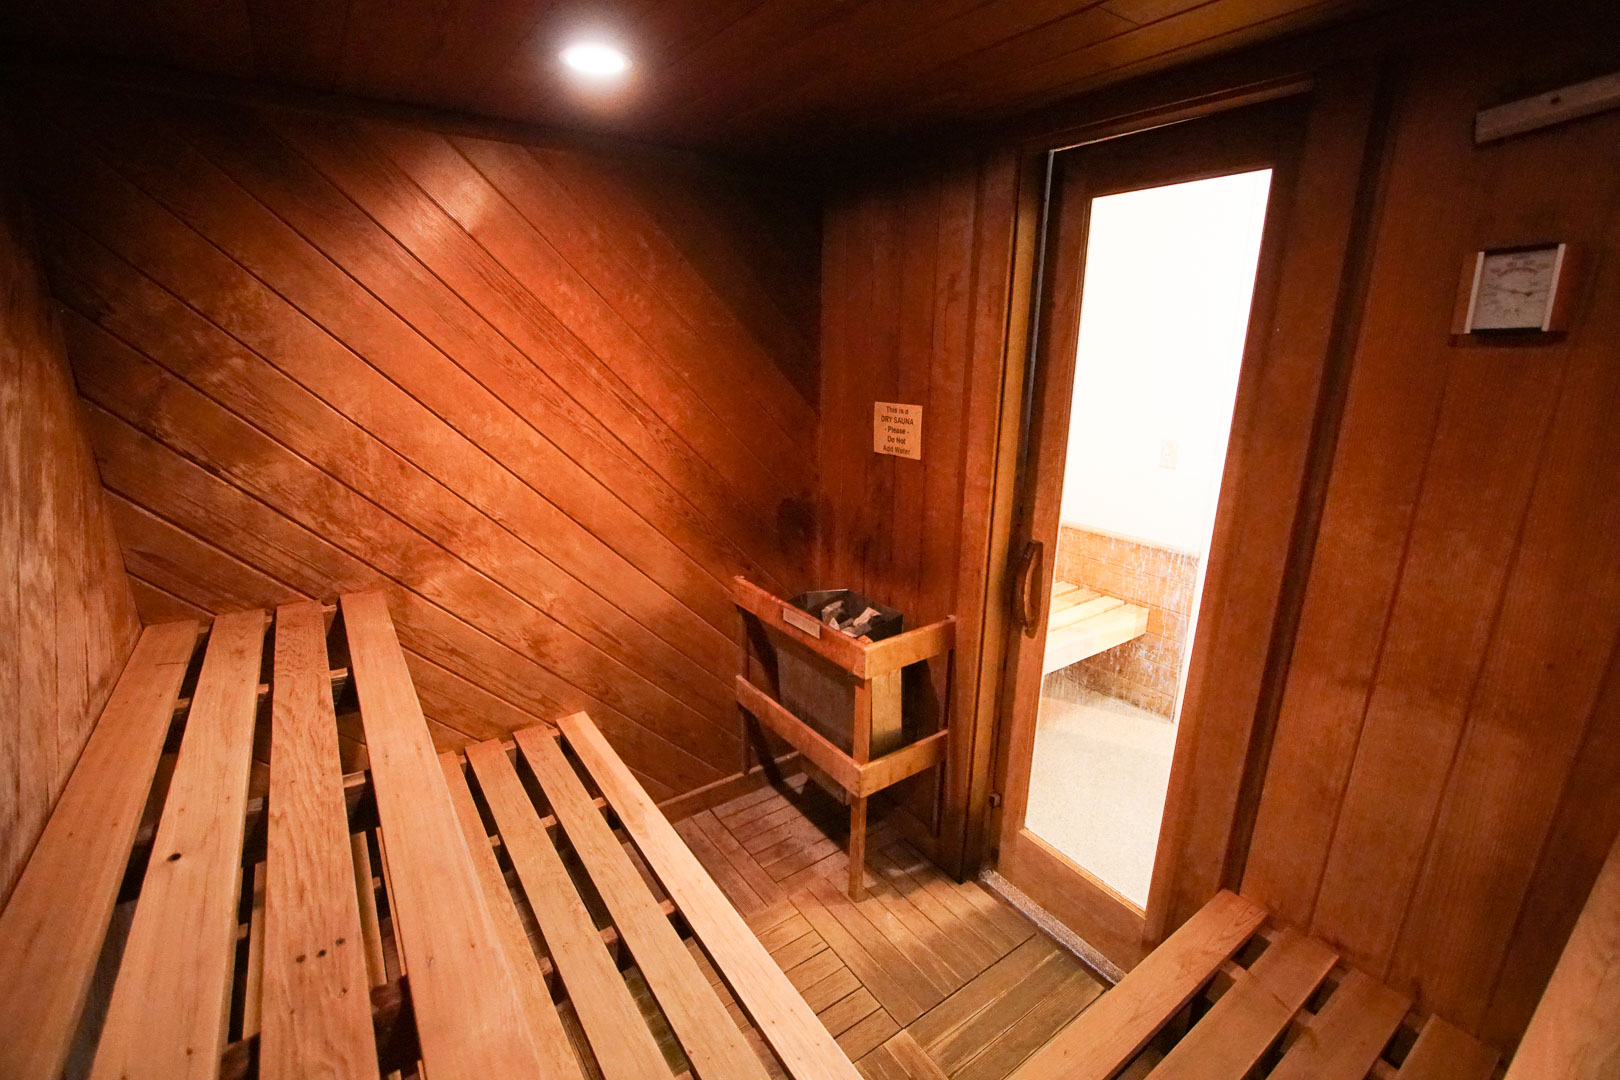 A relaxing hot sauna room at VRI's Brewster Green Resort in Massachusetts.